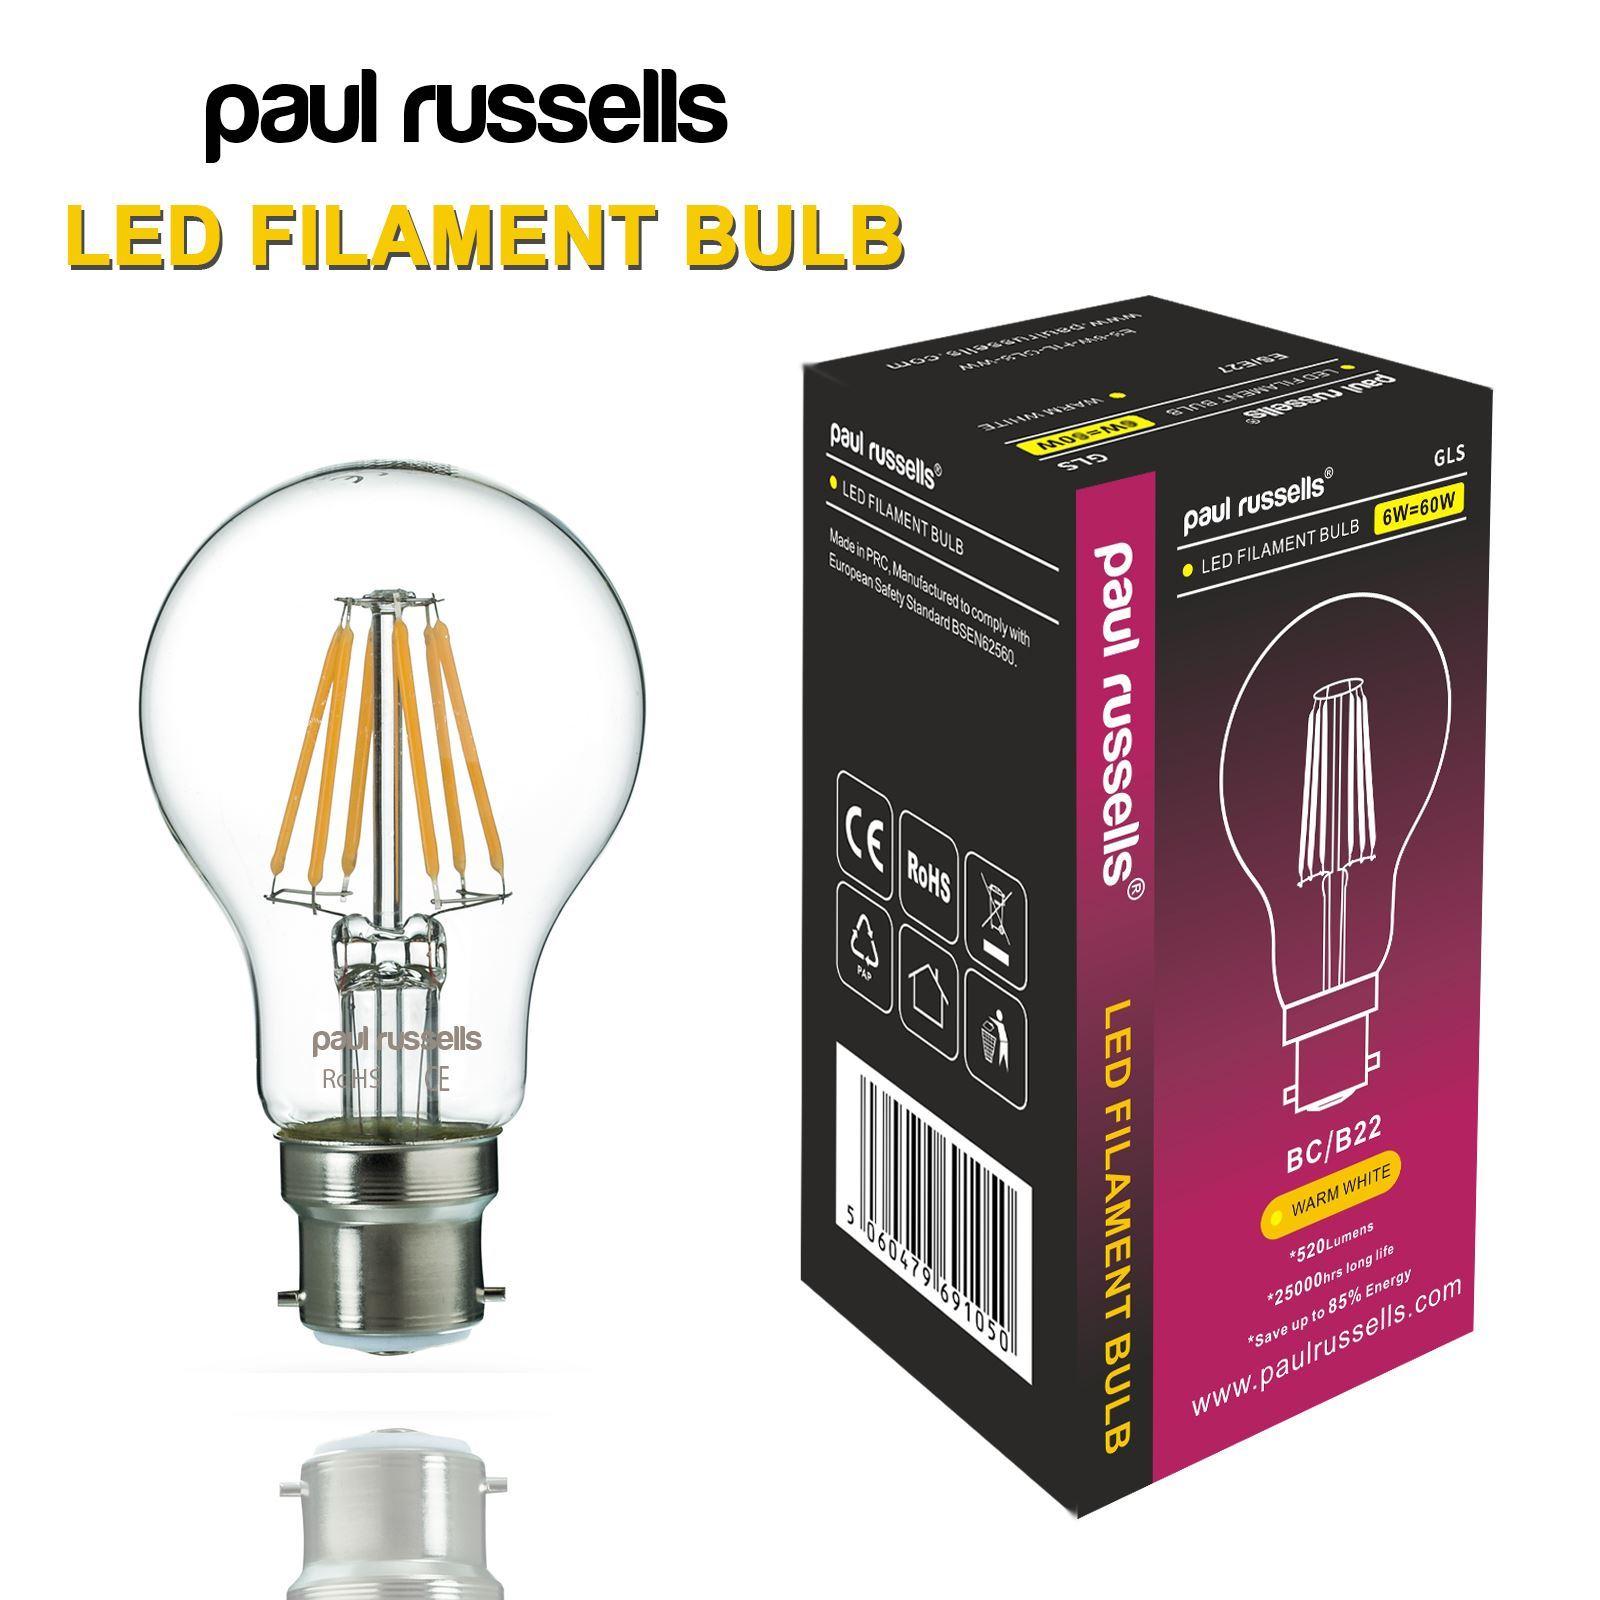 Affinity 4 2w 40w Filament Led Gls Es E27 Clear Light: E14 B22 E27 LED Filament Bulbs LED Golf GLS Lamp Candle